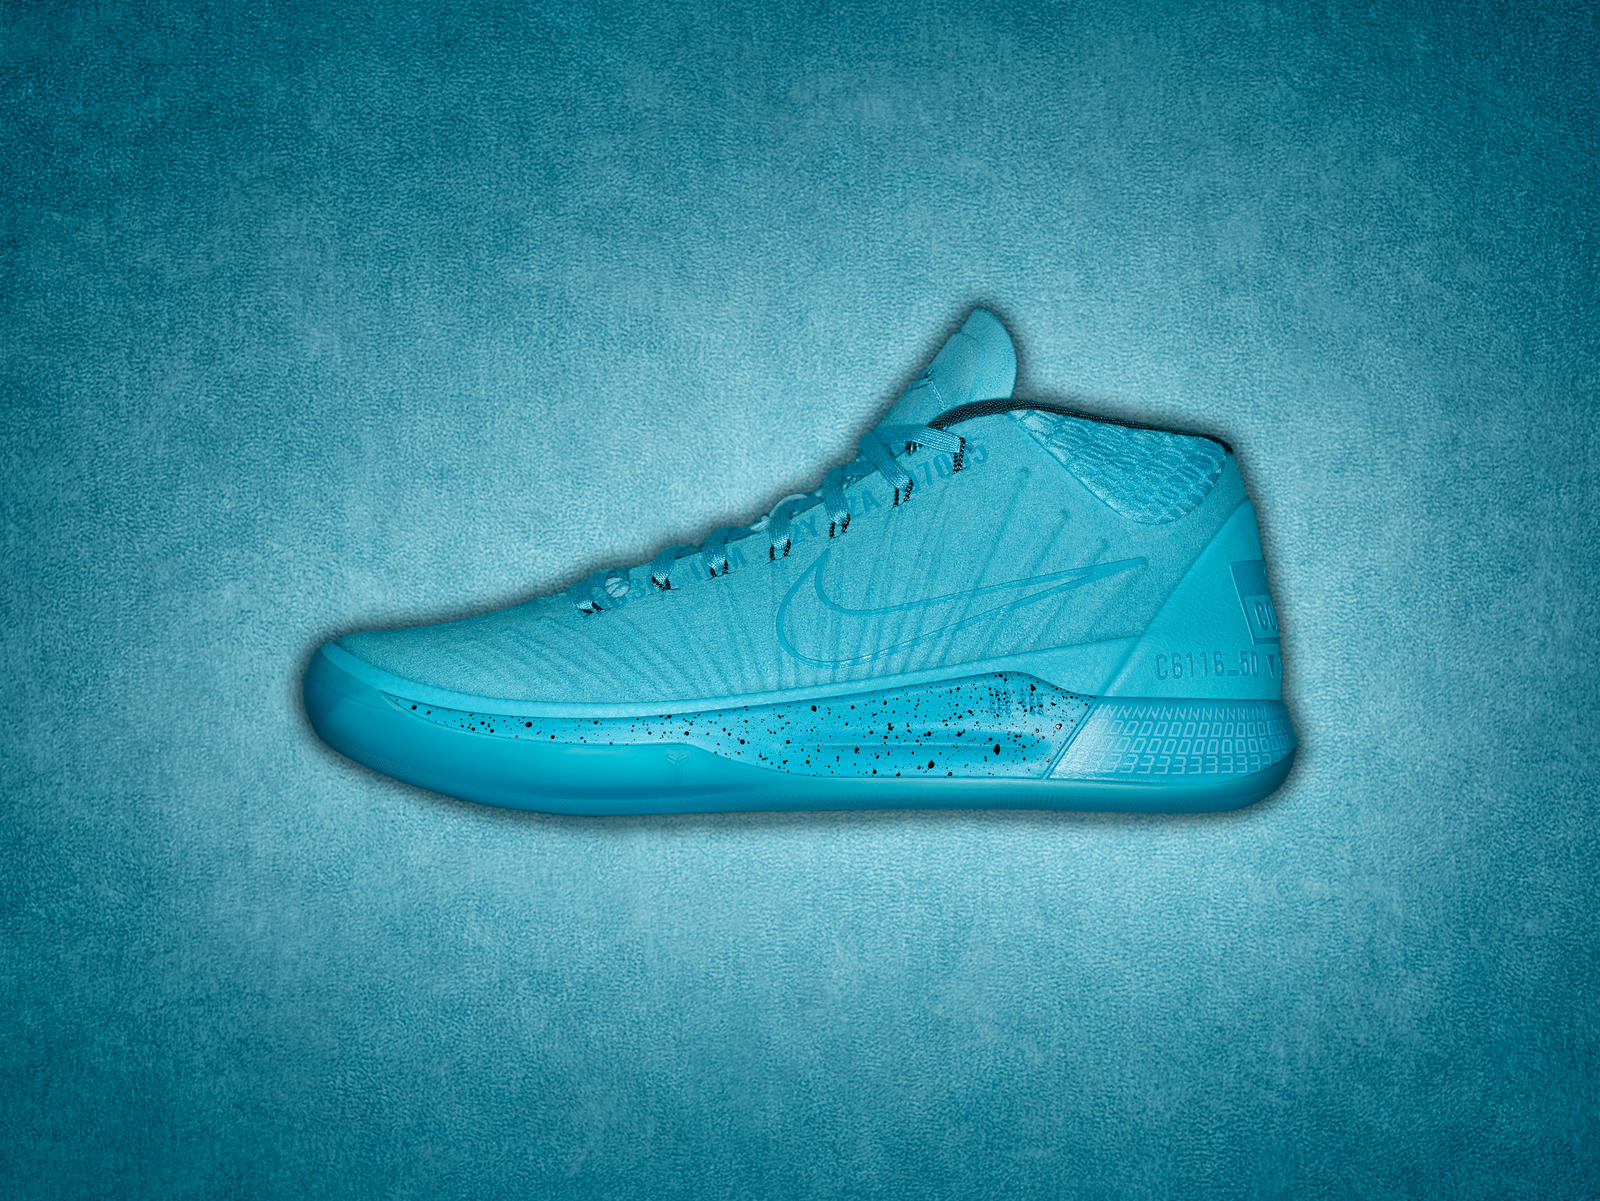 sale retailer 2c78a a075b Nike Campaign Channels Kobe Bryant s Color Philosophy